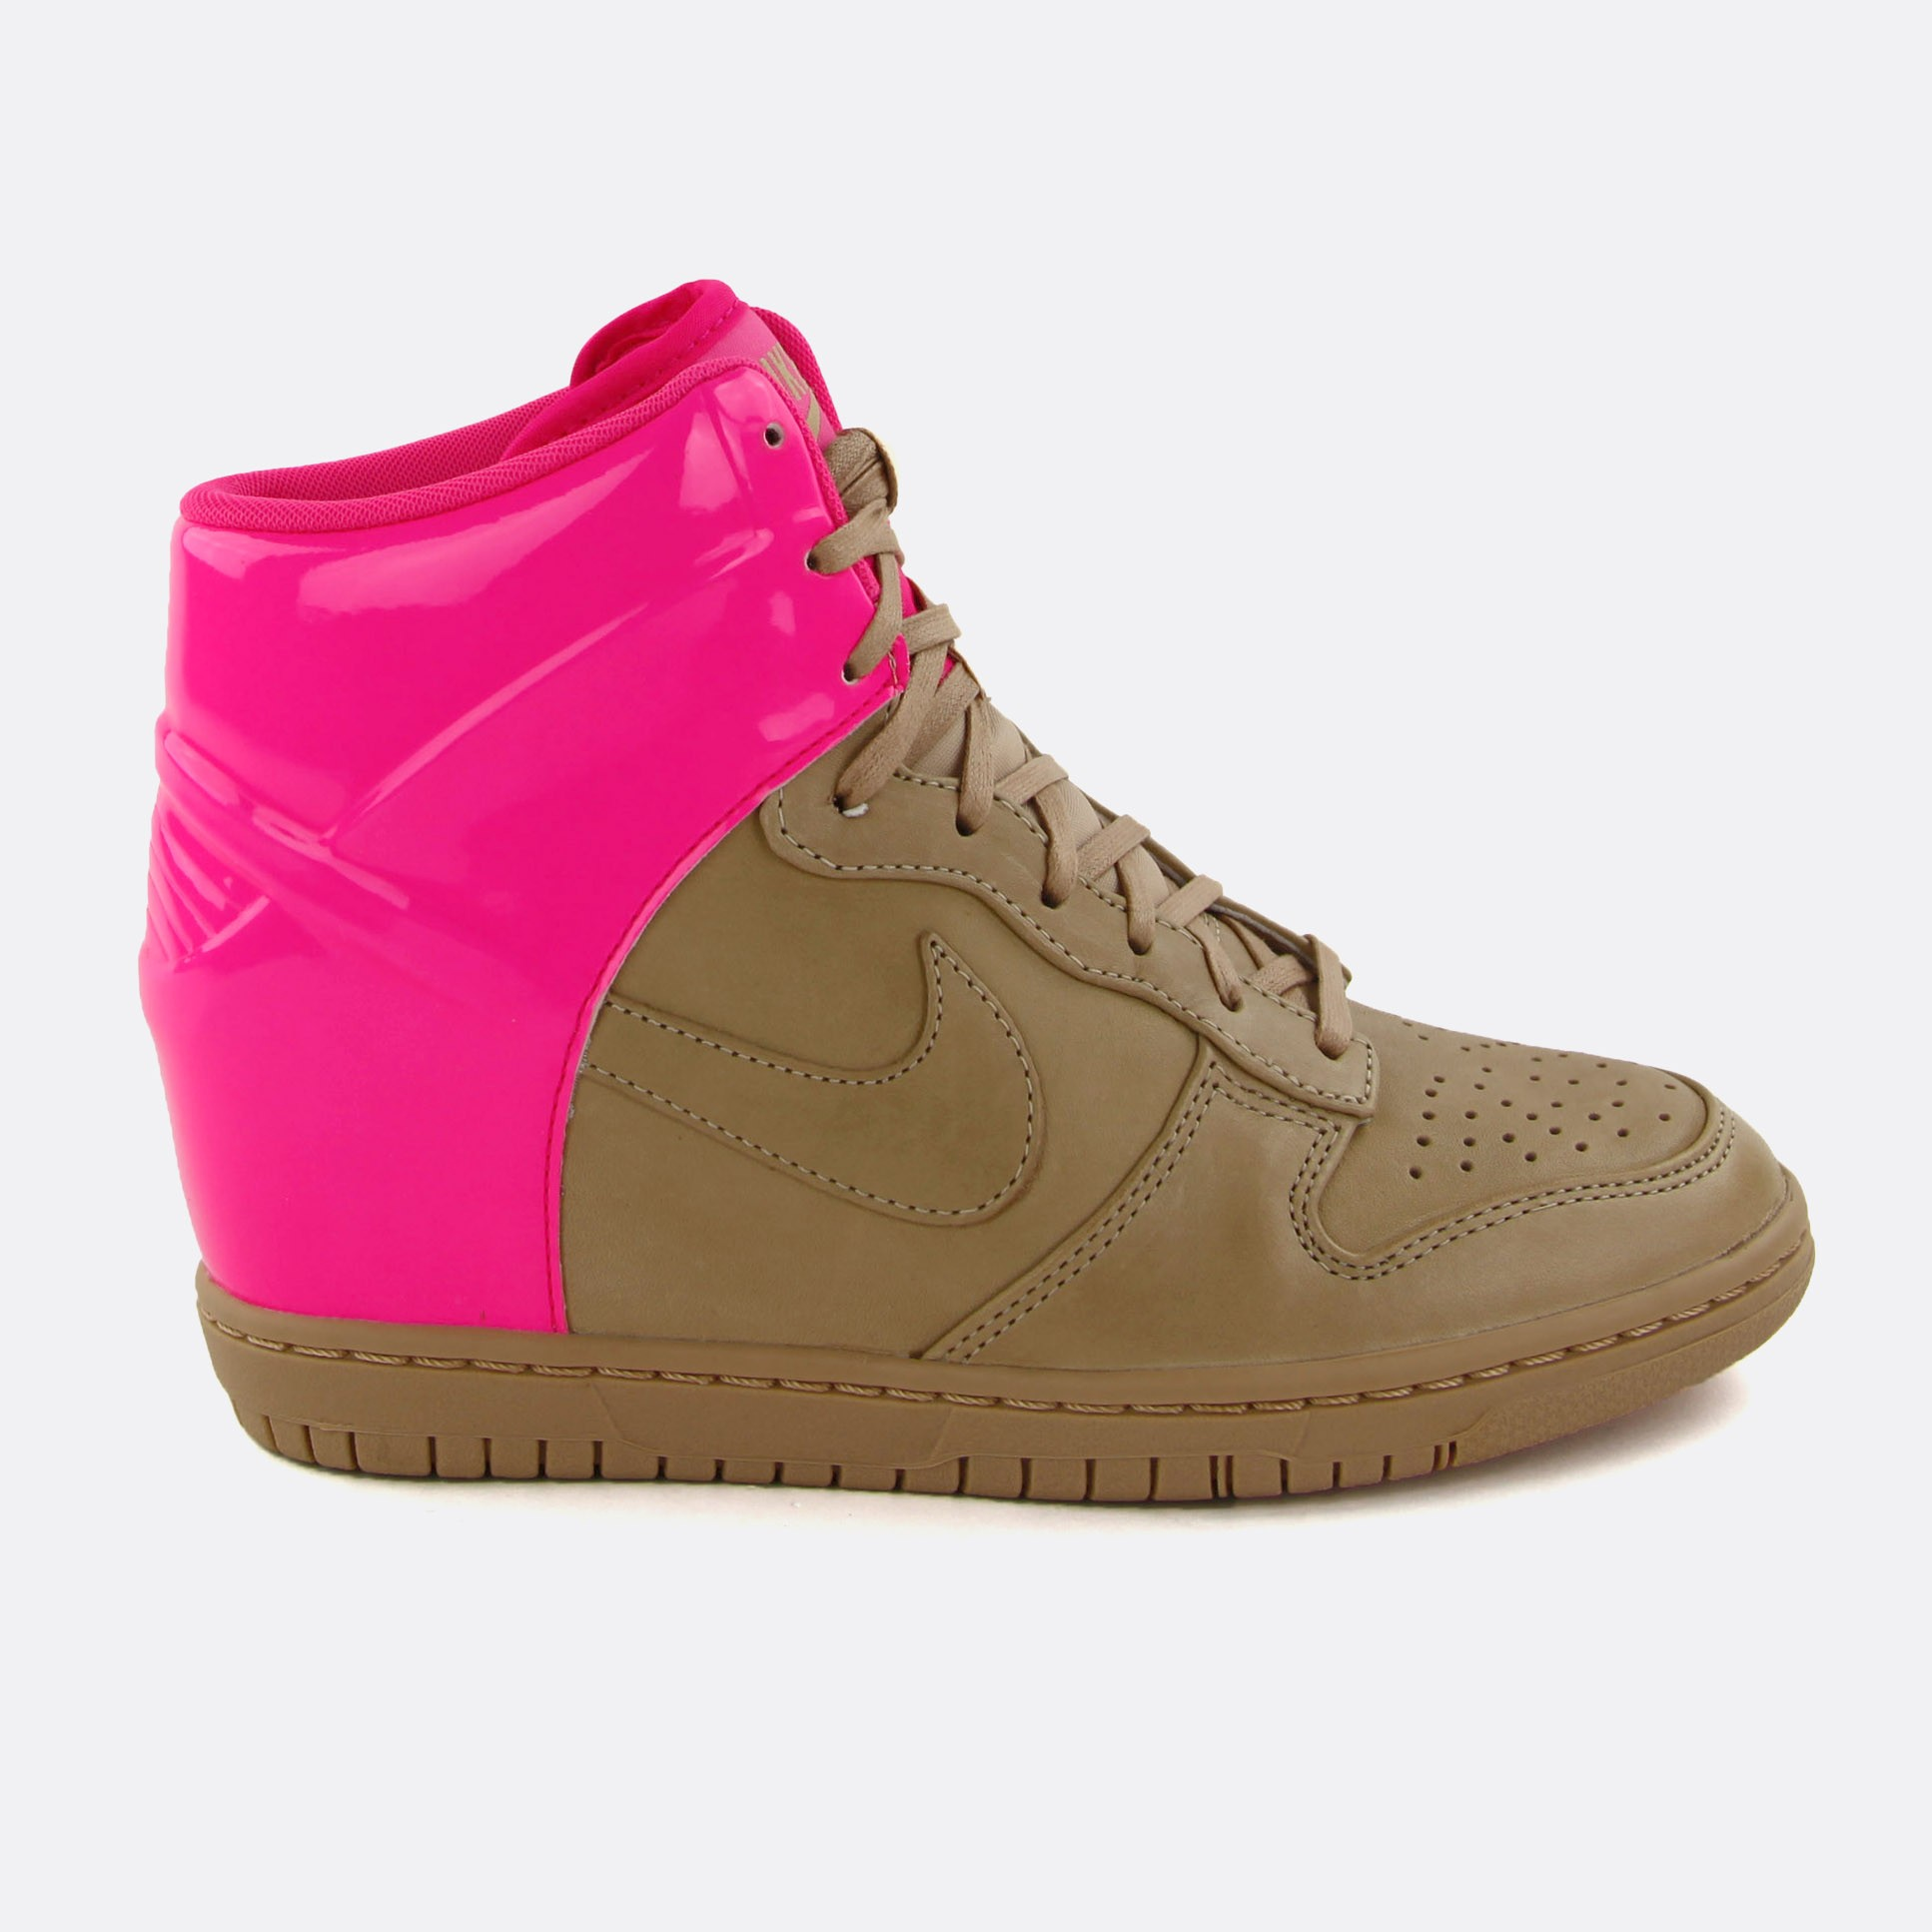 Sepatu Nike Dunk Sky Hi - Musée des impressionnismes Giverny 4b806d270a